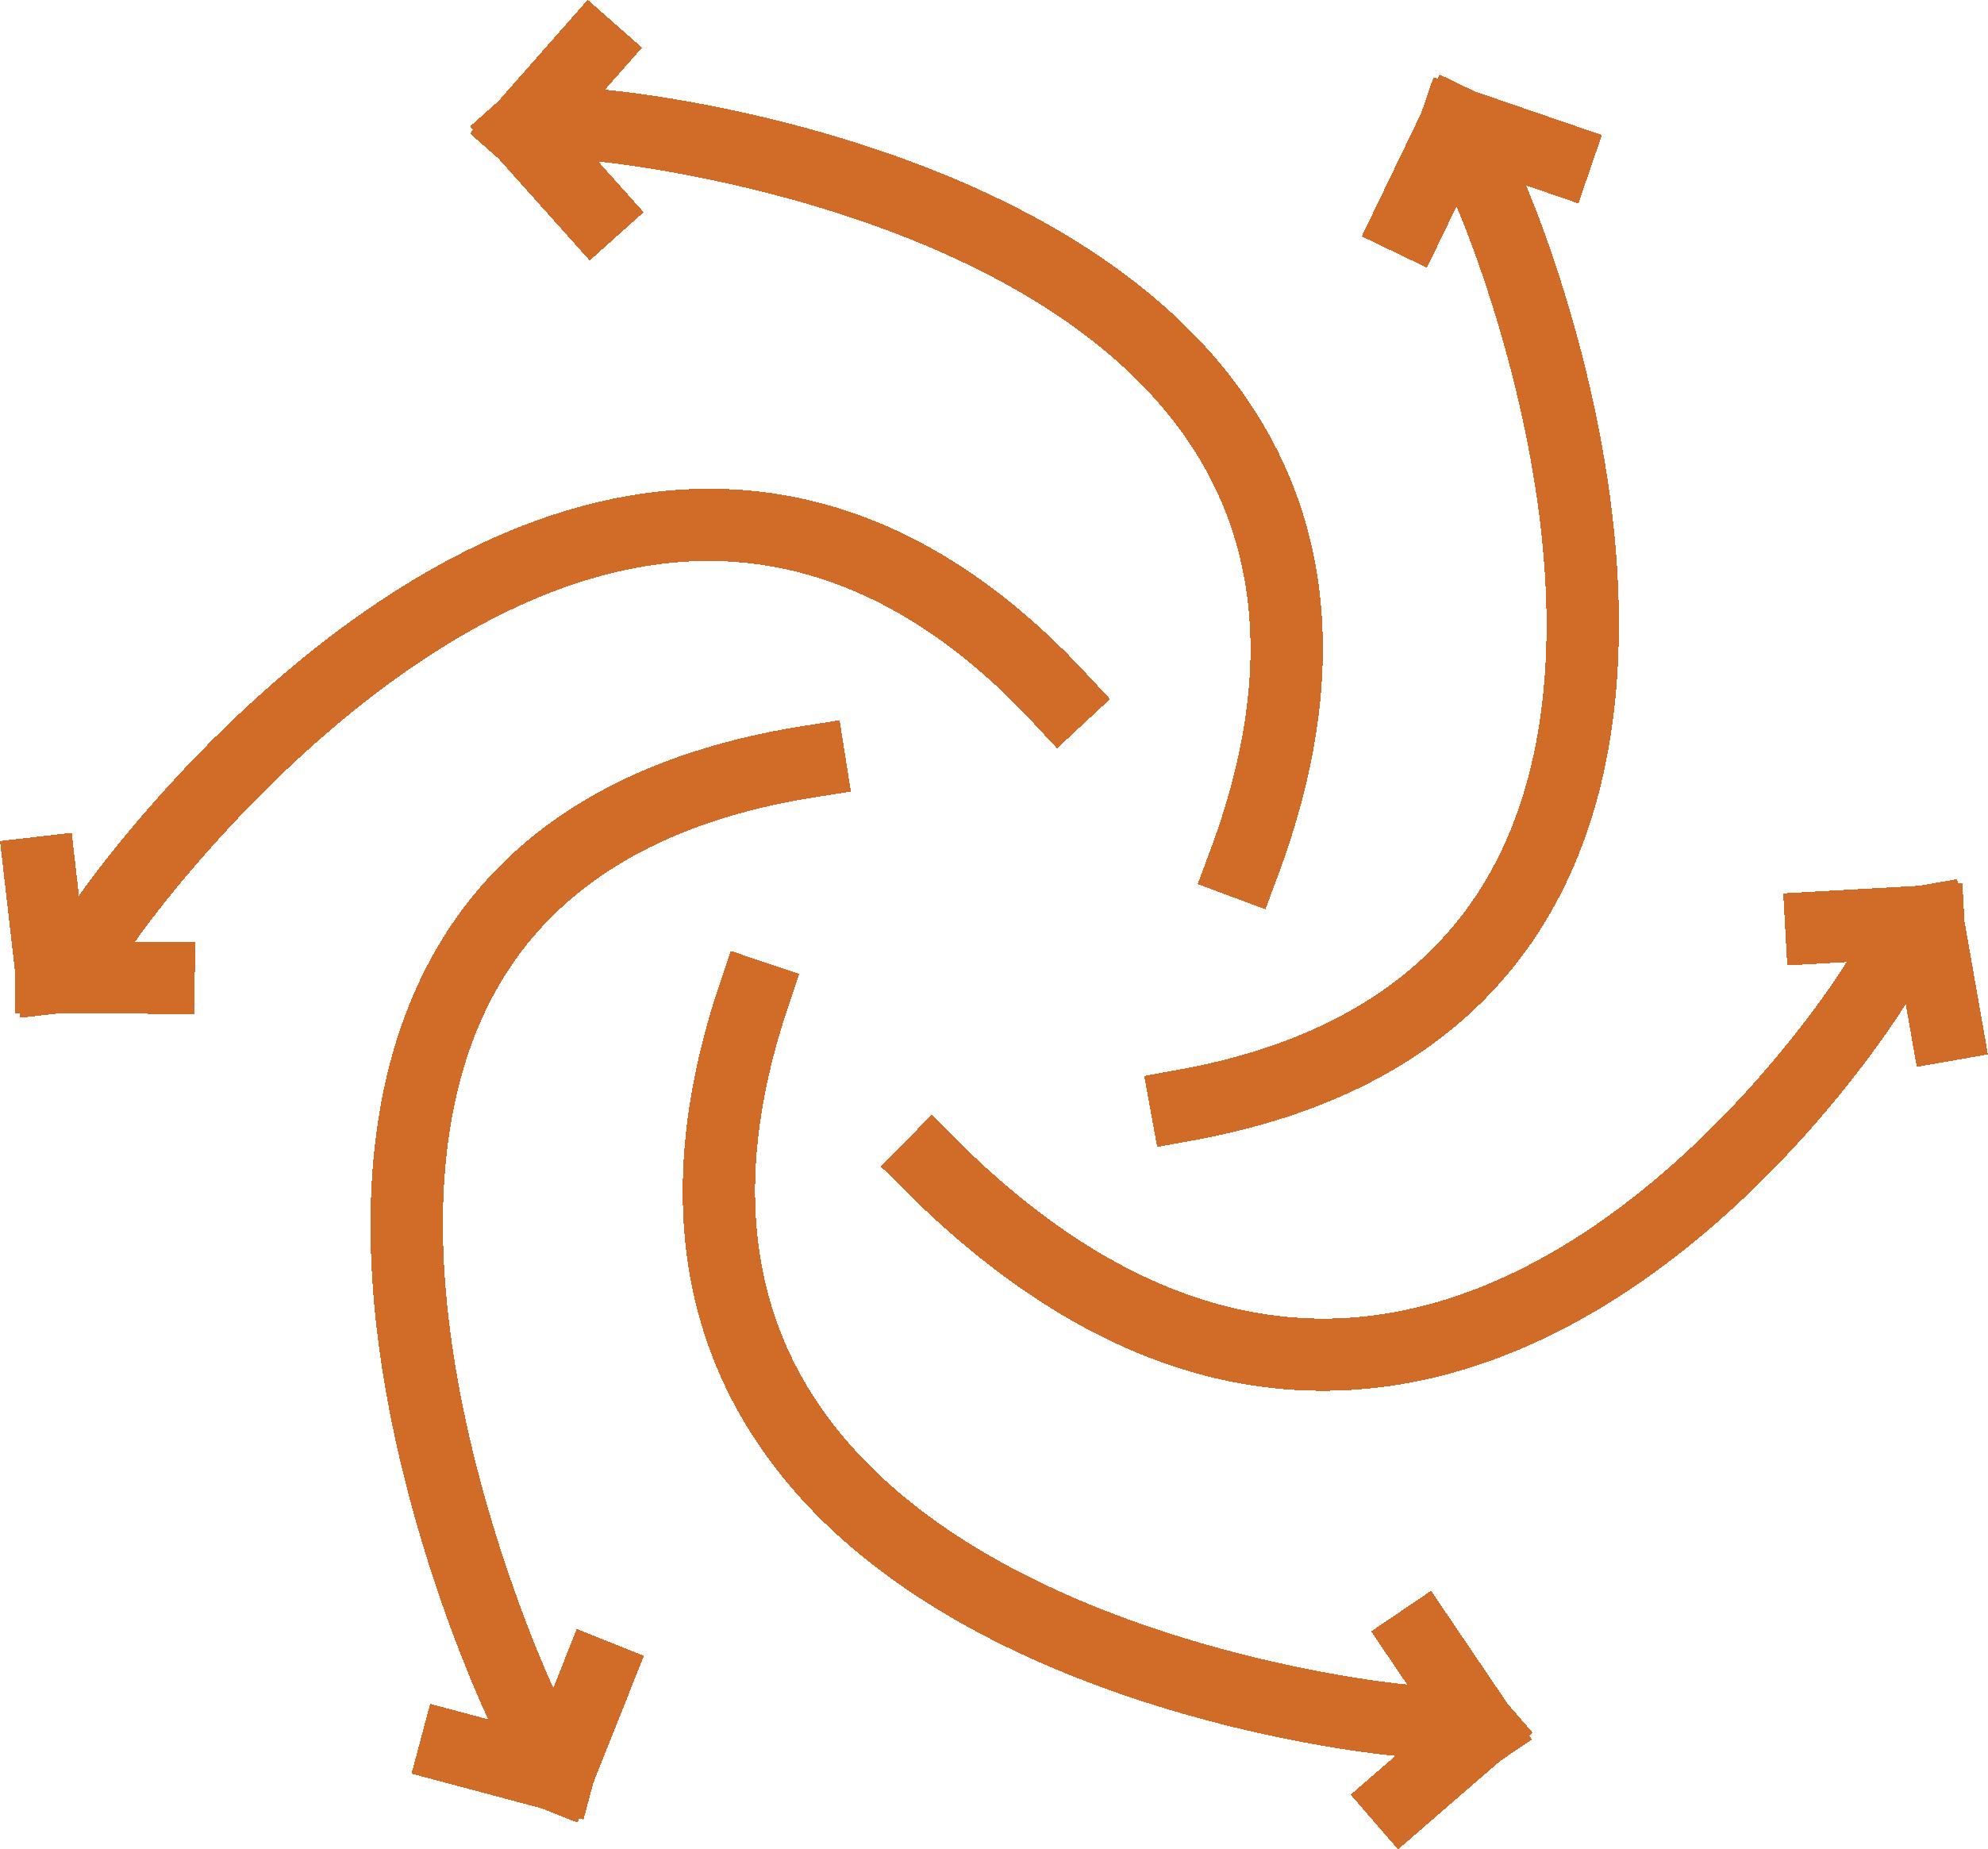 circular orange arrows facing outward